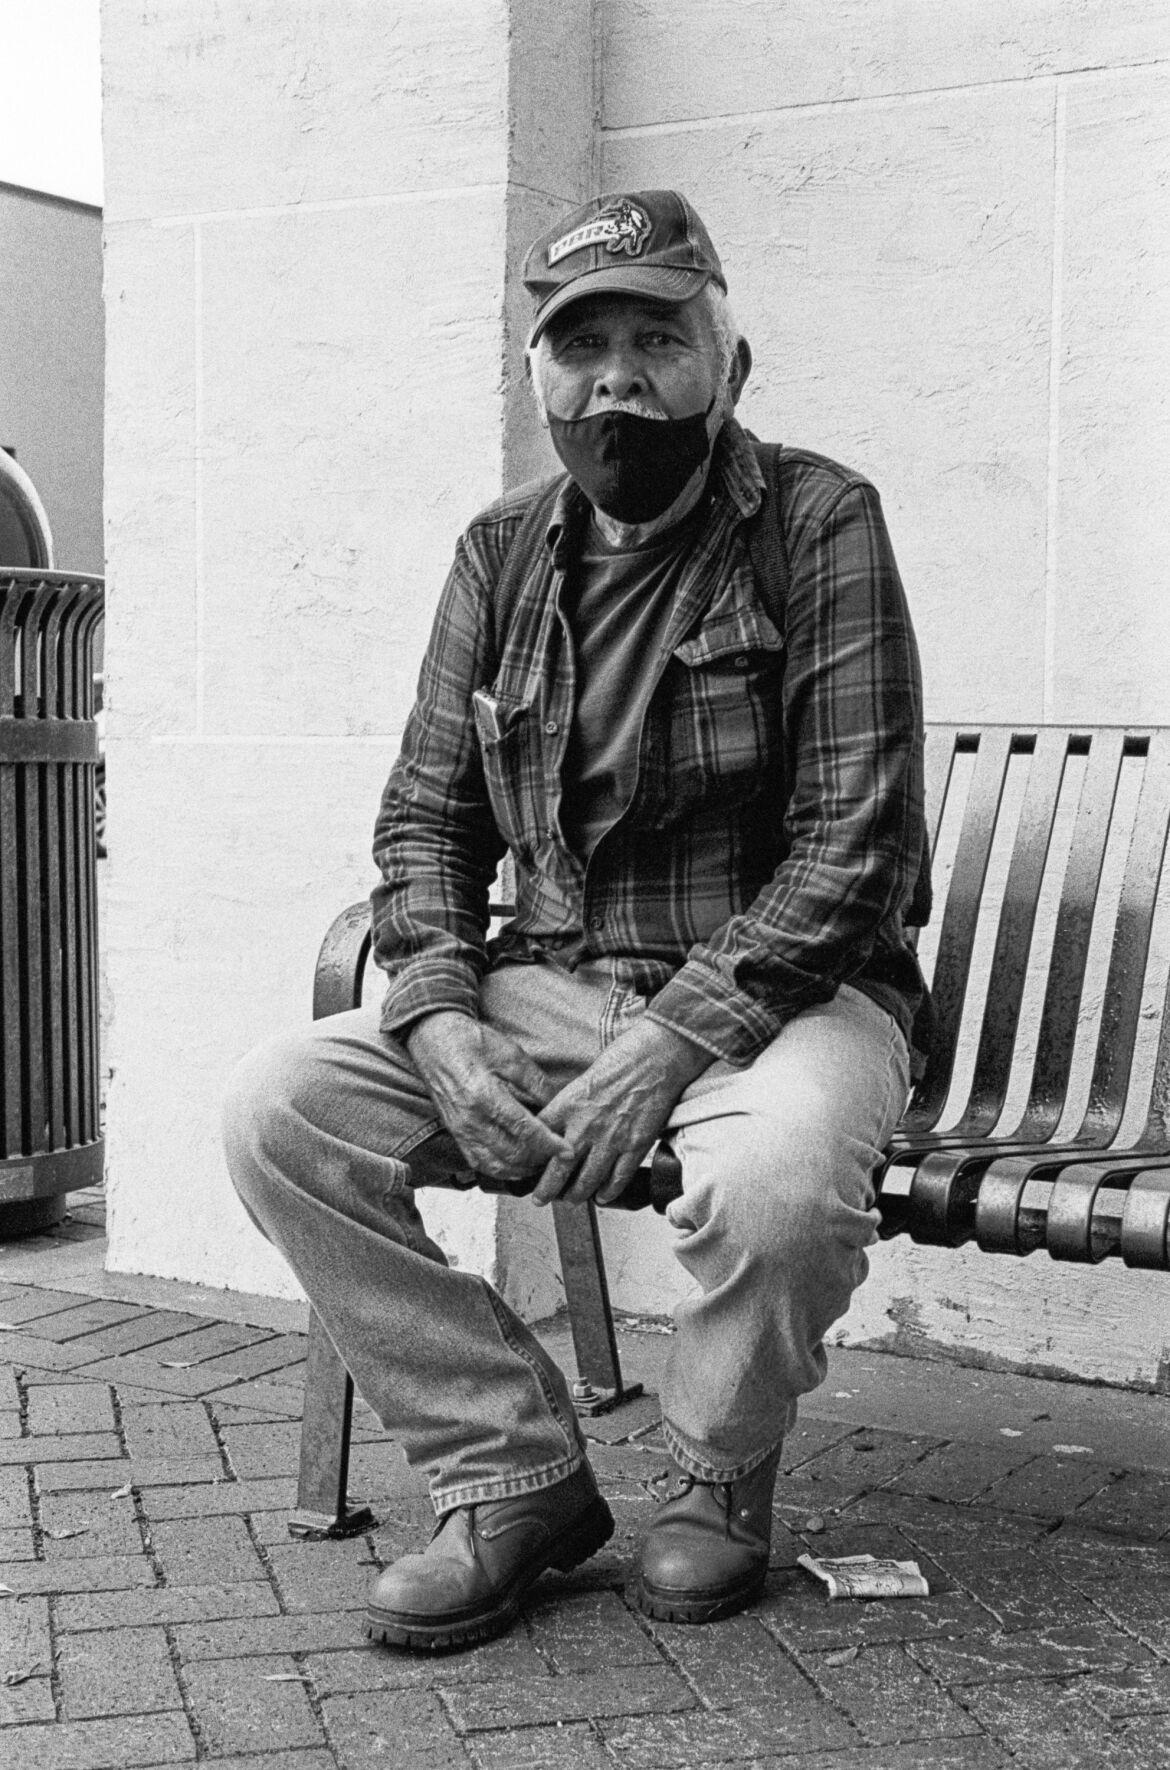 John Valdivia - Film Photographer